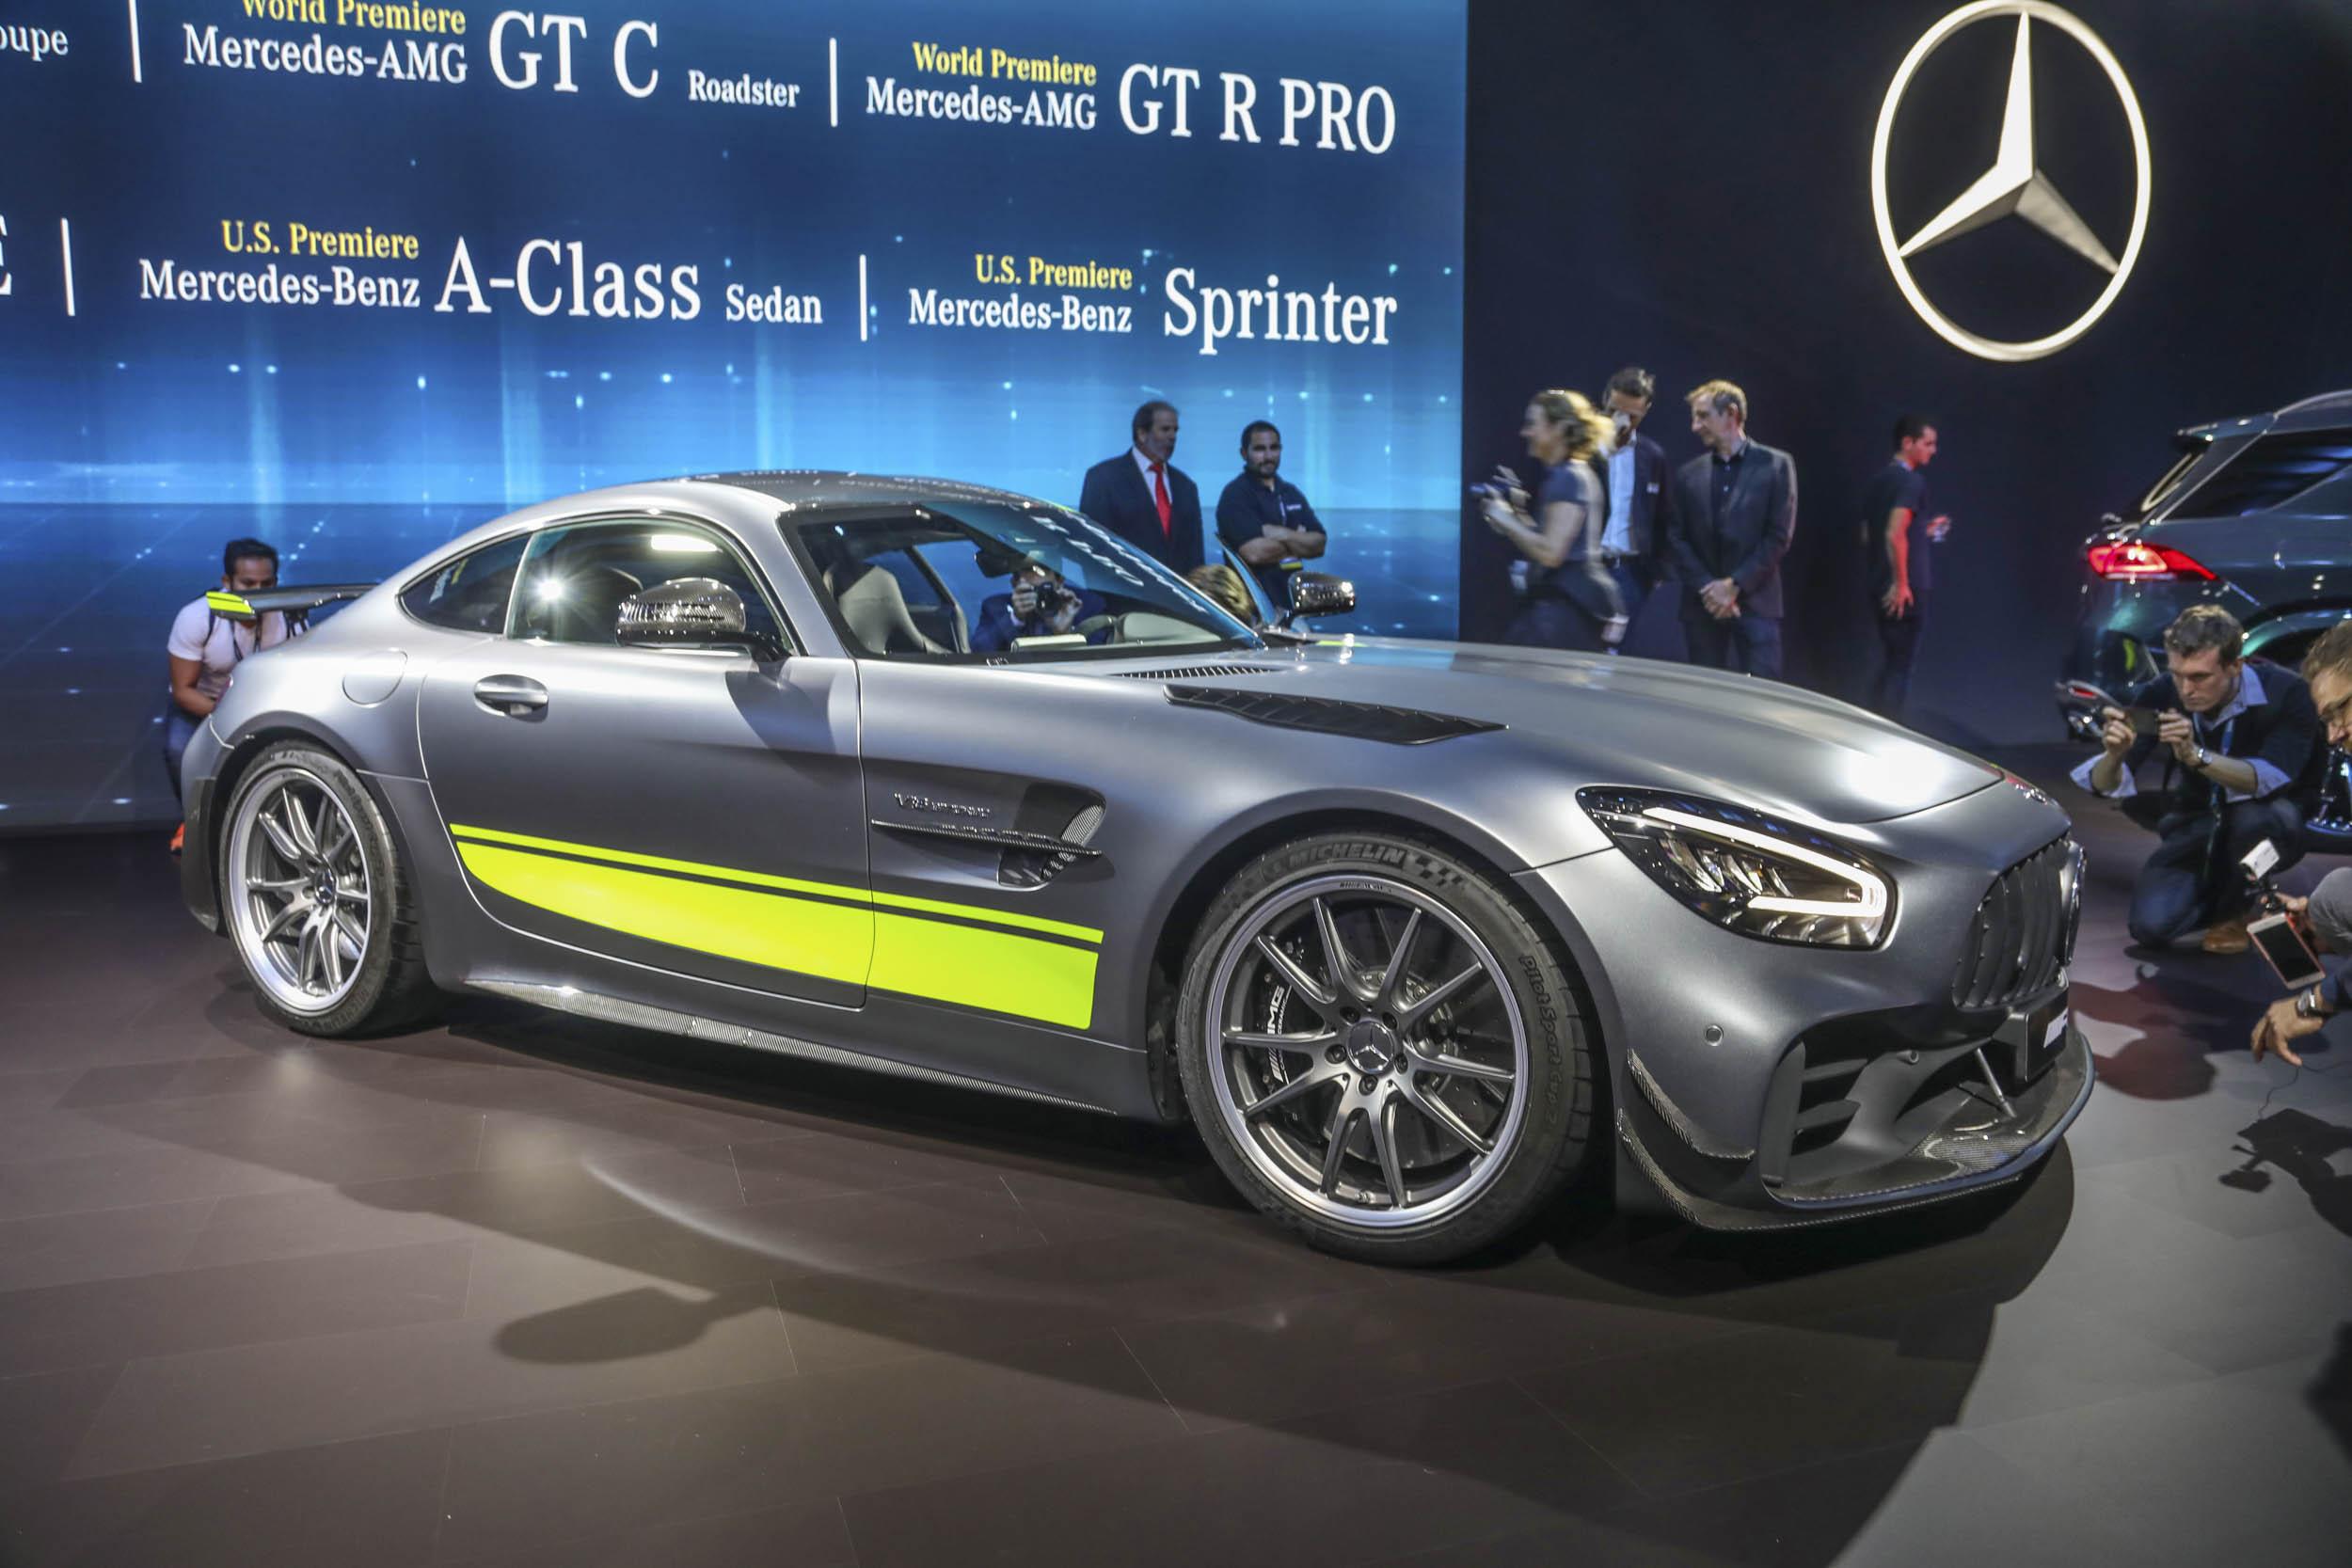 Mercedes-AMG GT R Pro LA Auto Show